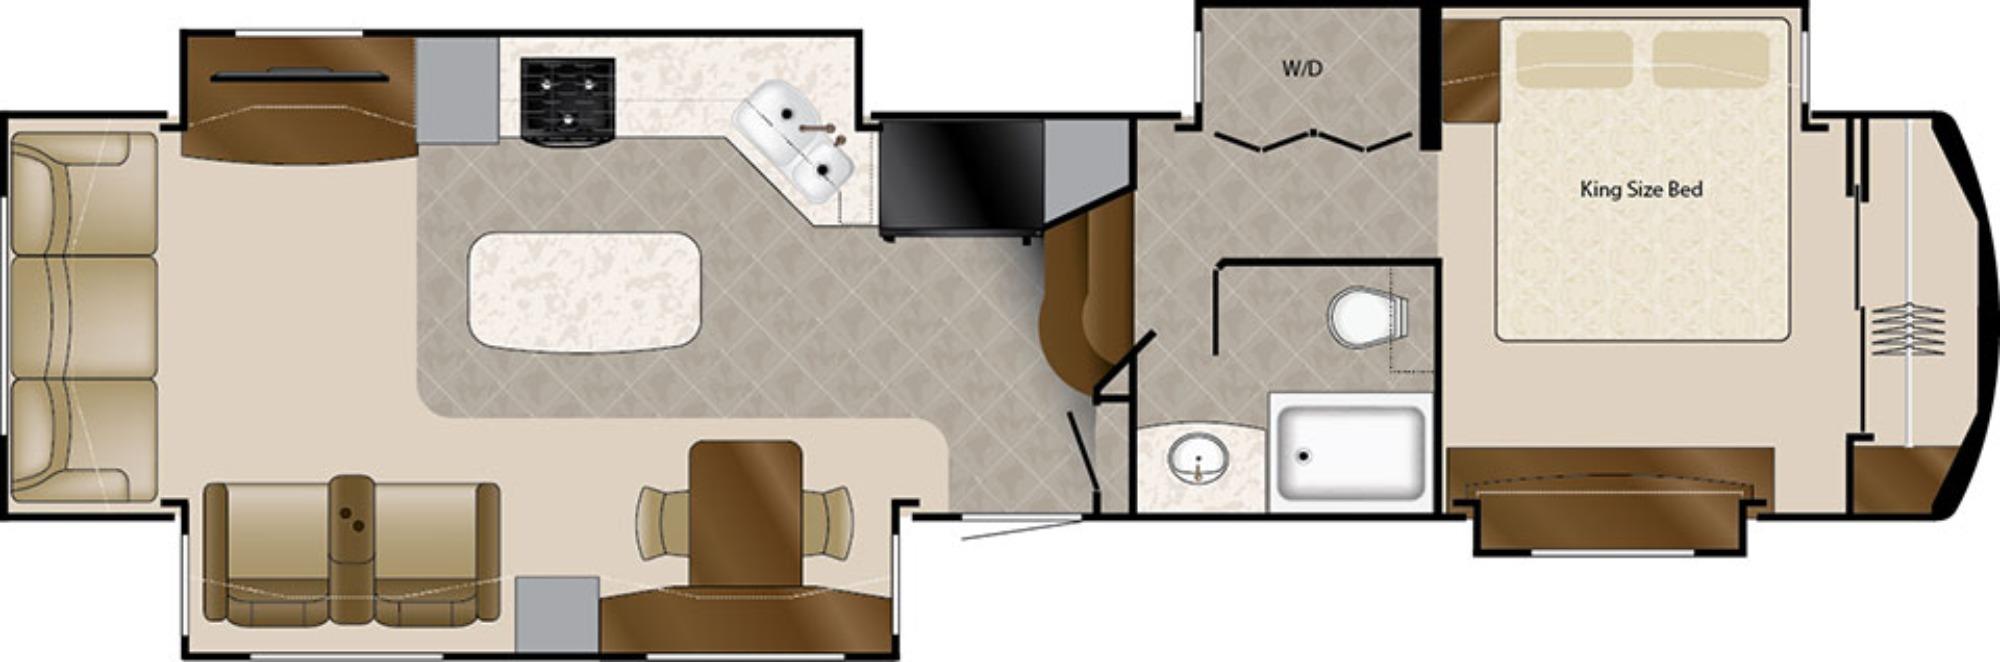 View Floor Plan for 2018 DRV LUXURY SUITES MOBILE SUITES 40KSSB4